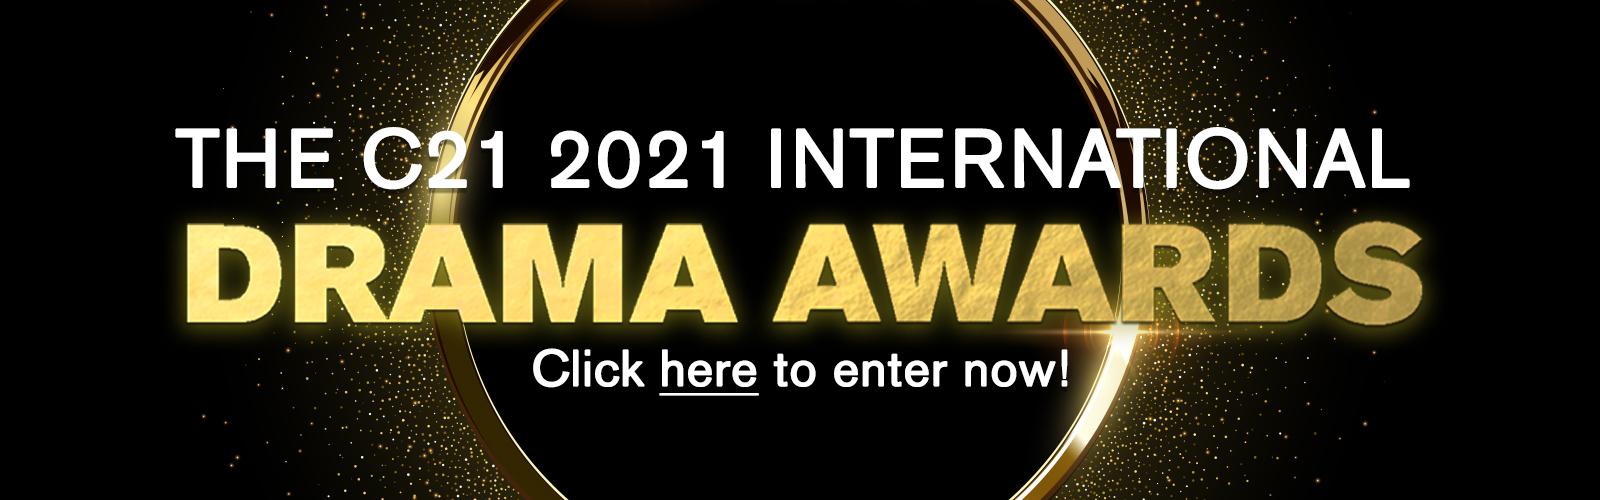 Drama Awards Banner